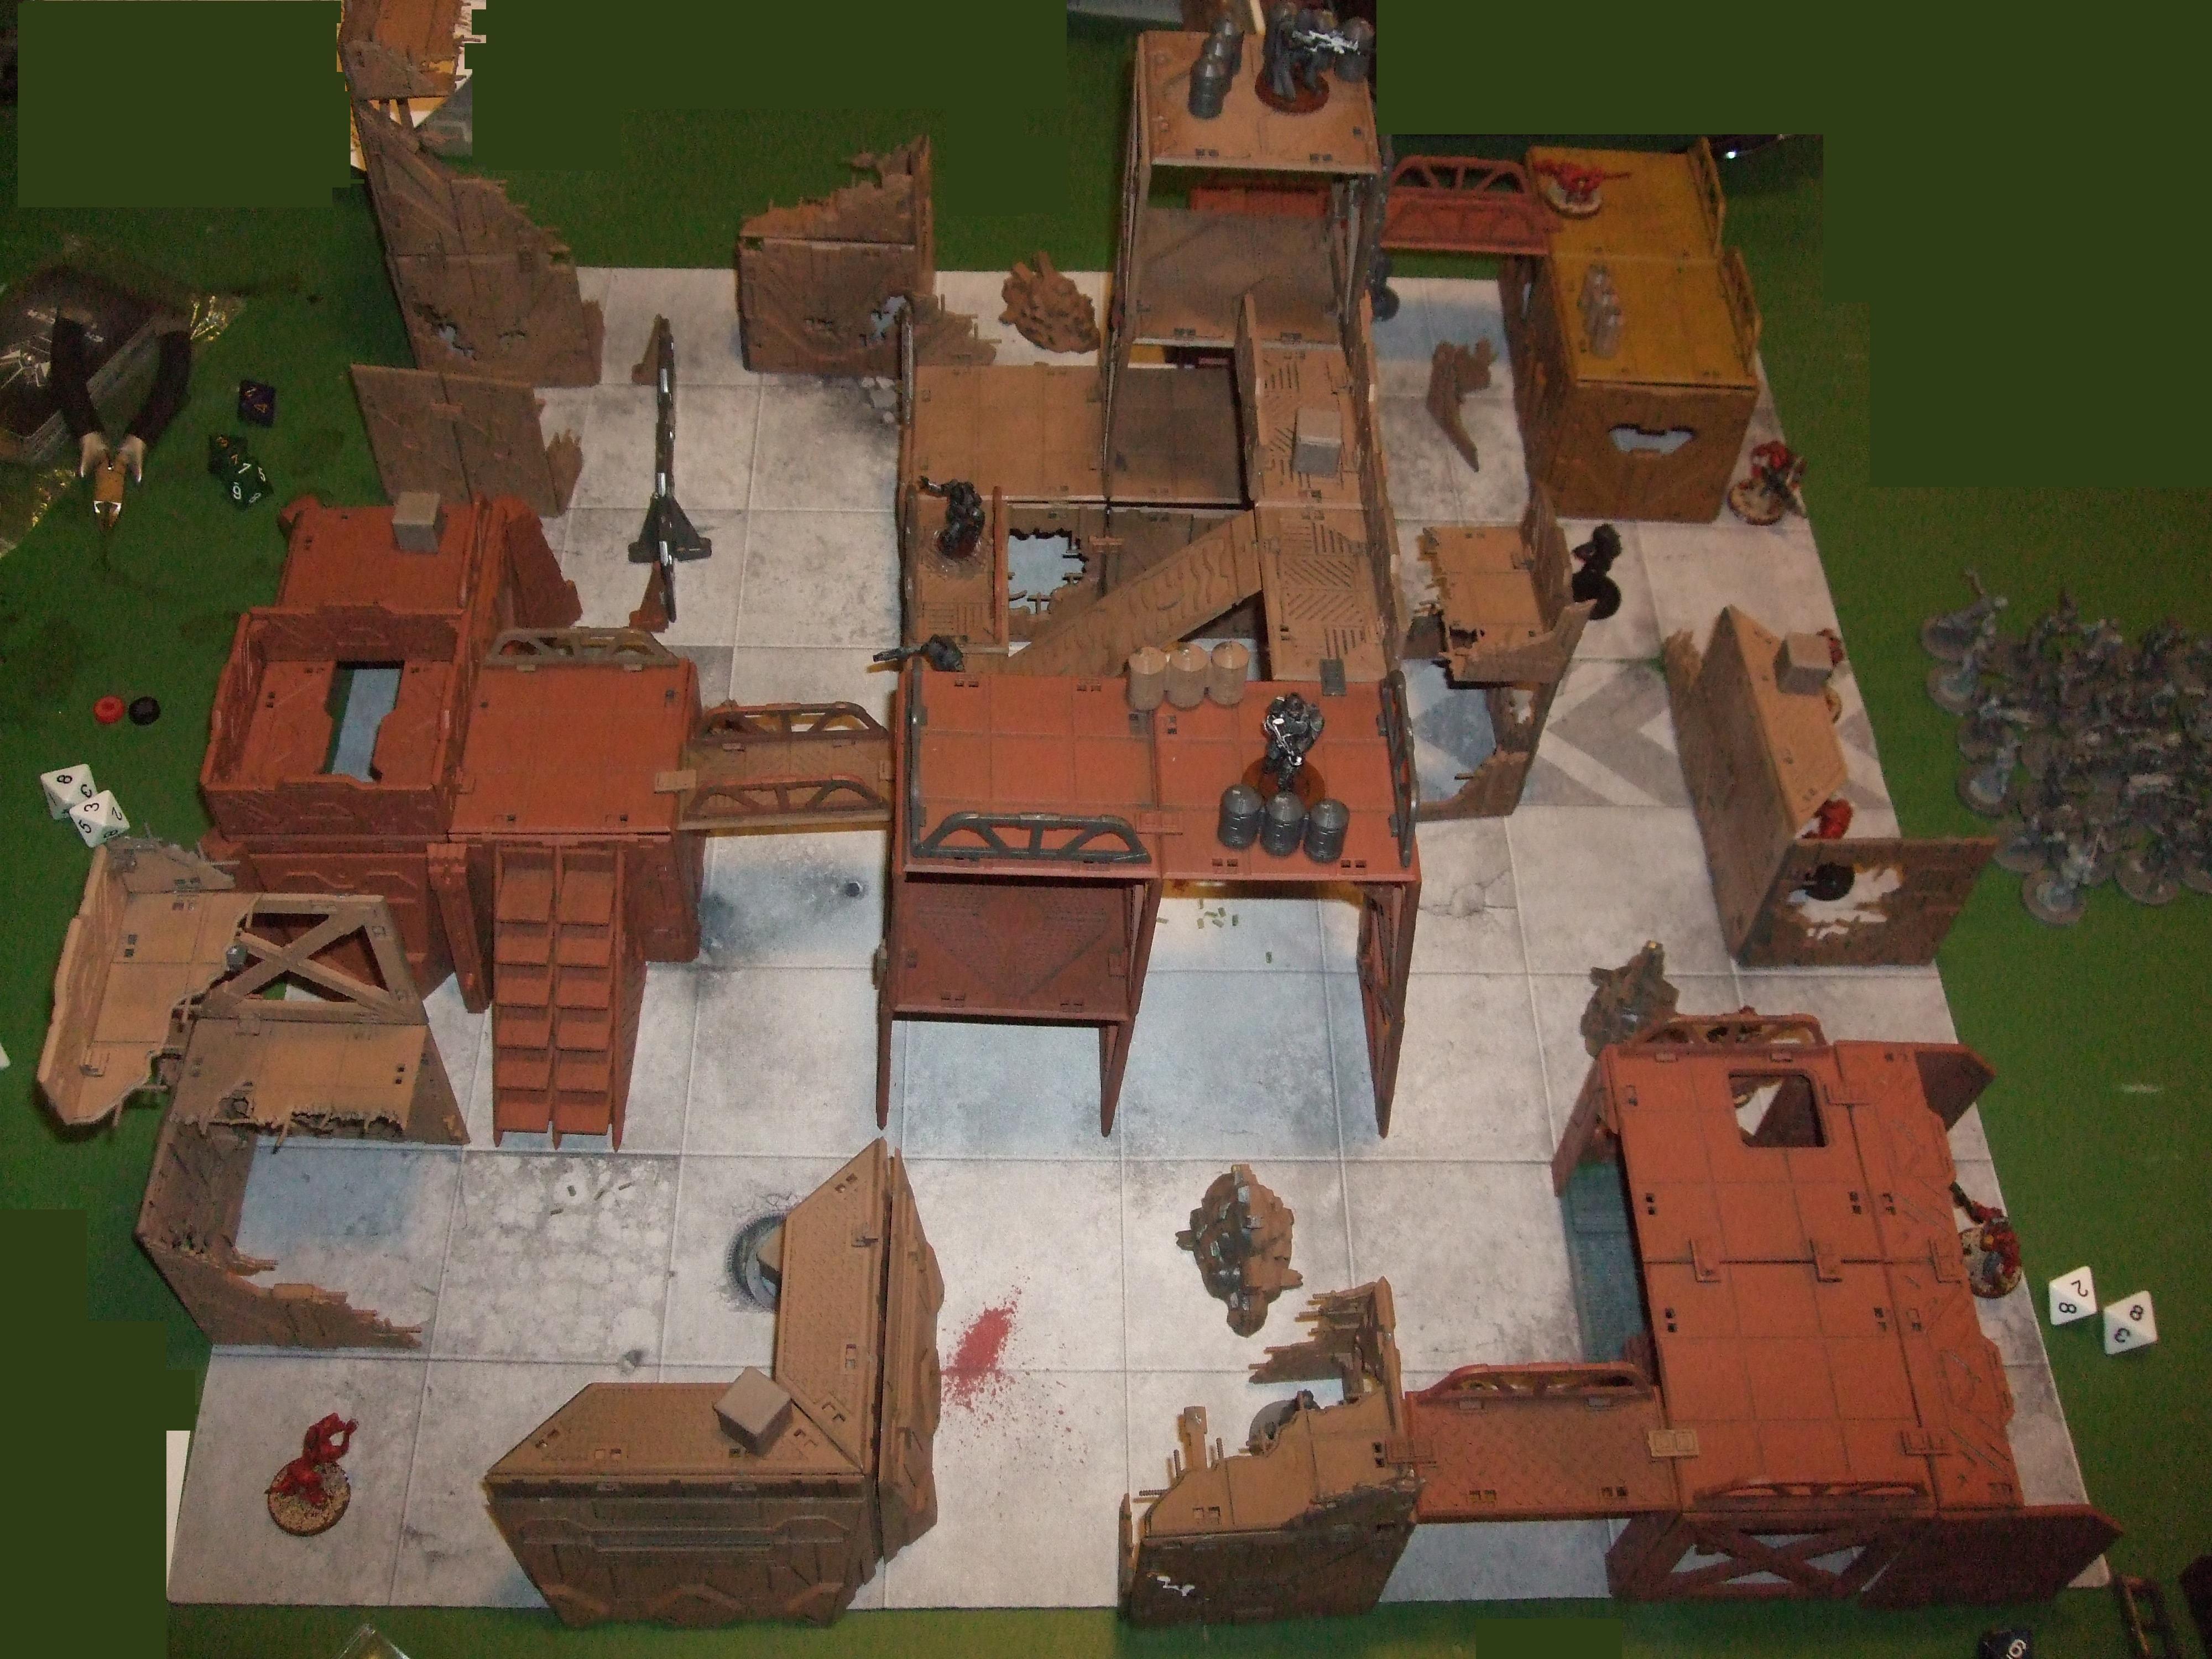 Coop, Deadzone, Mantic Games, Solo, Zombie